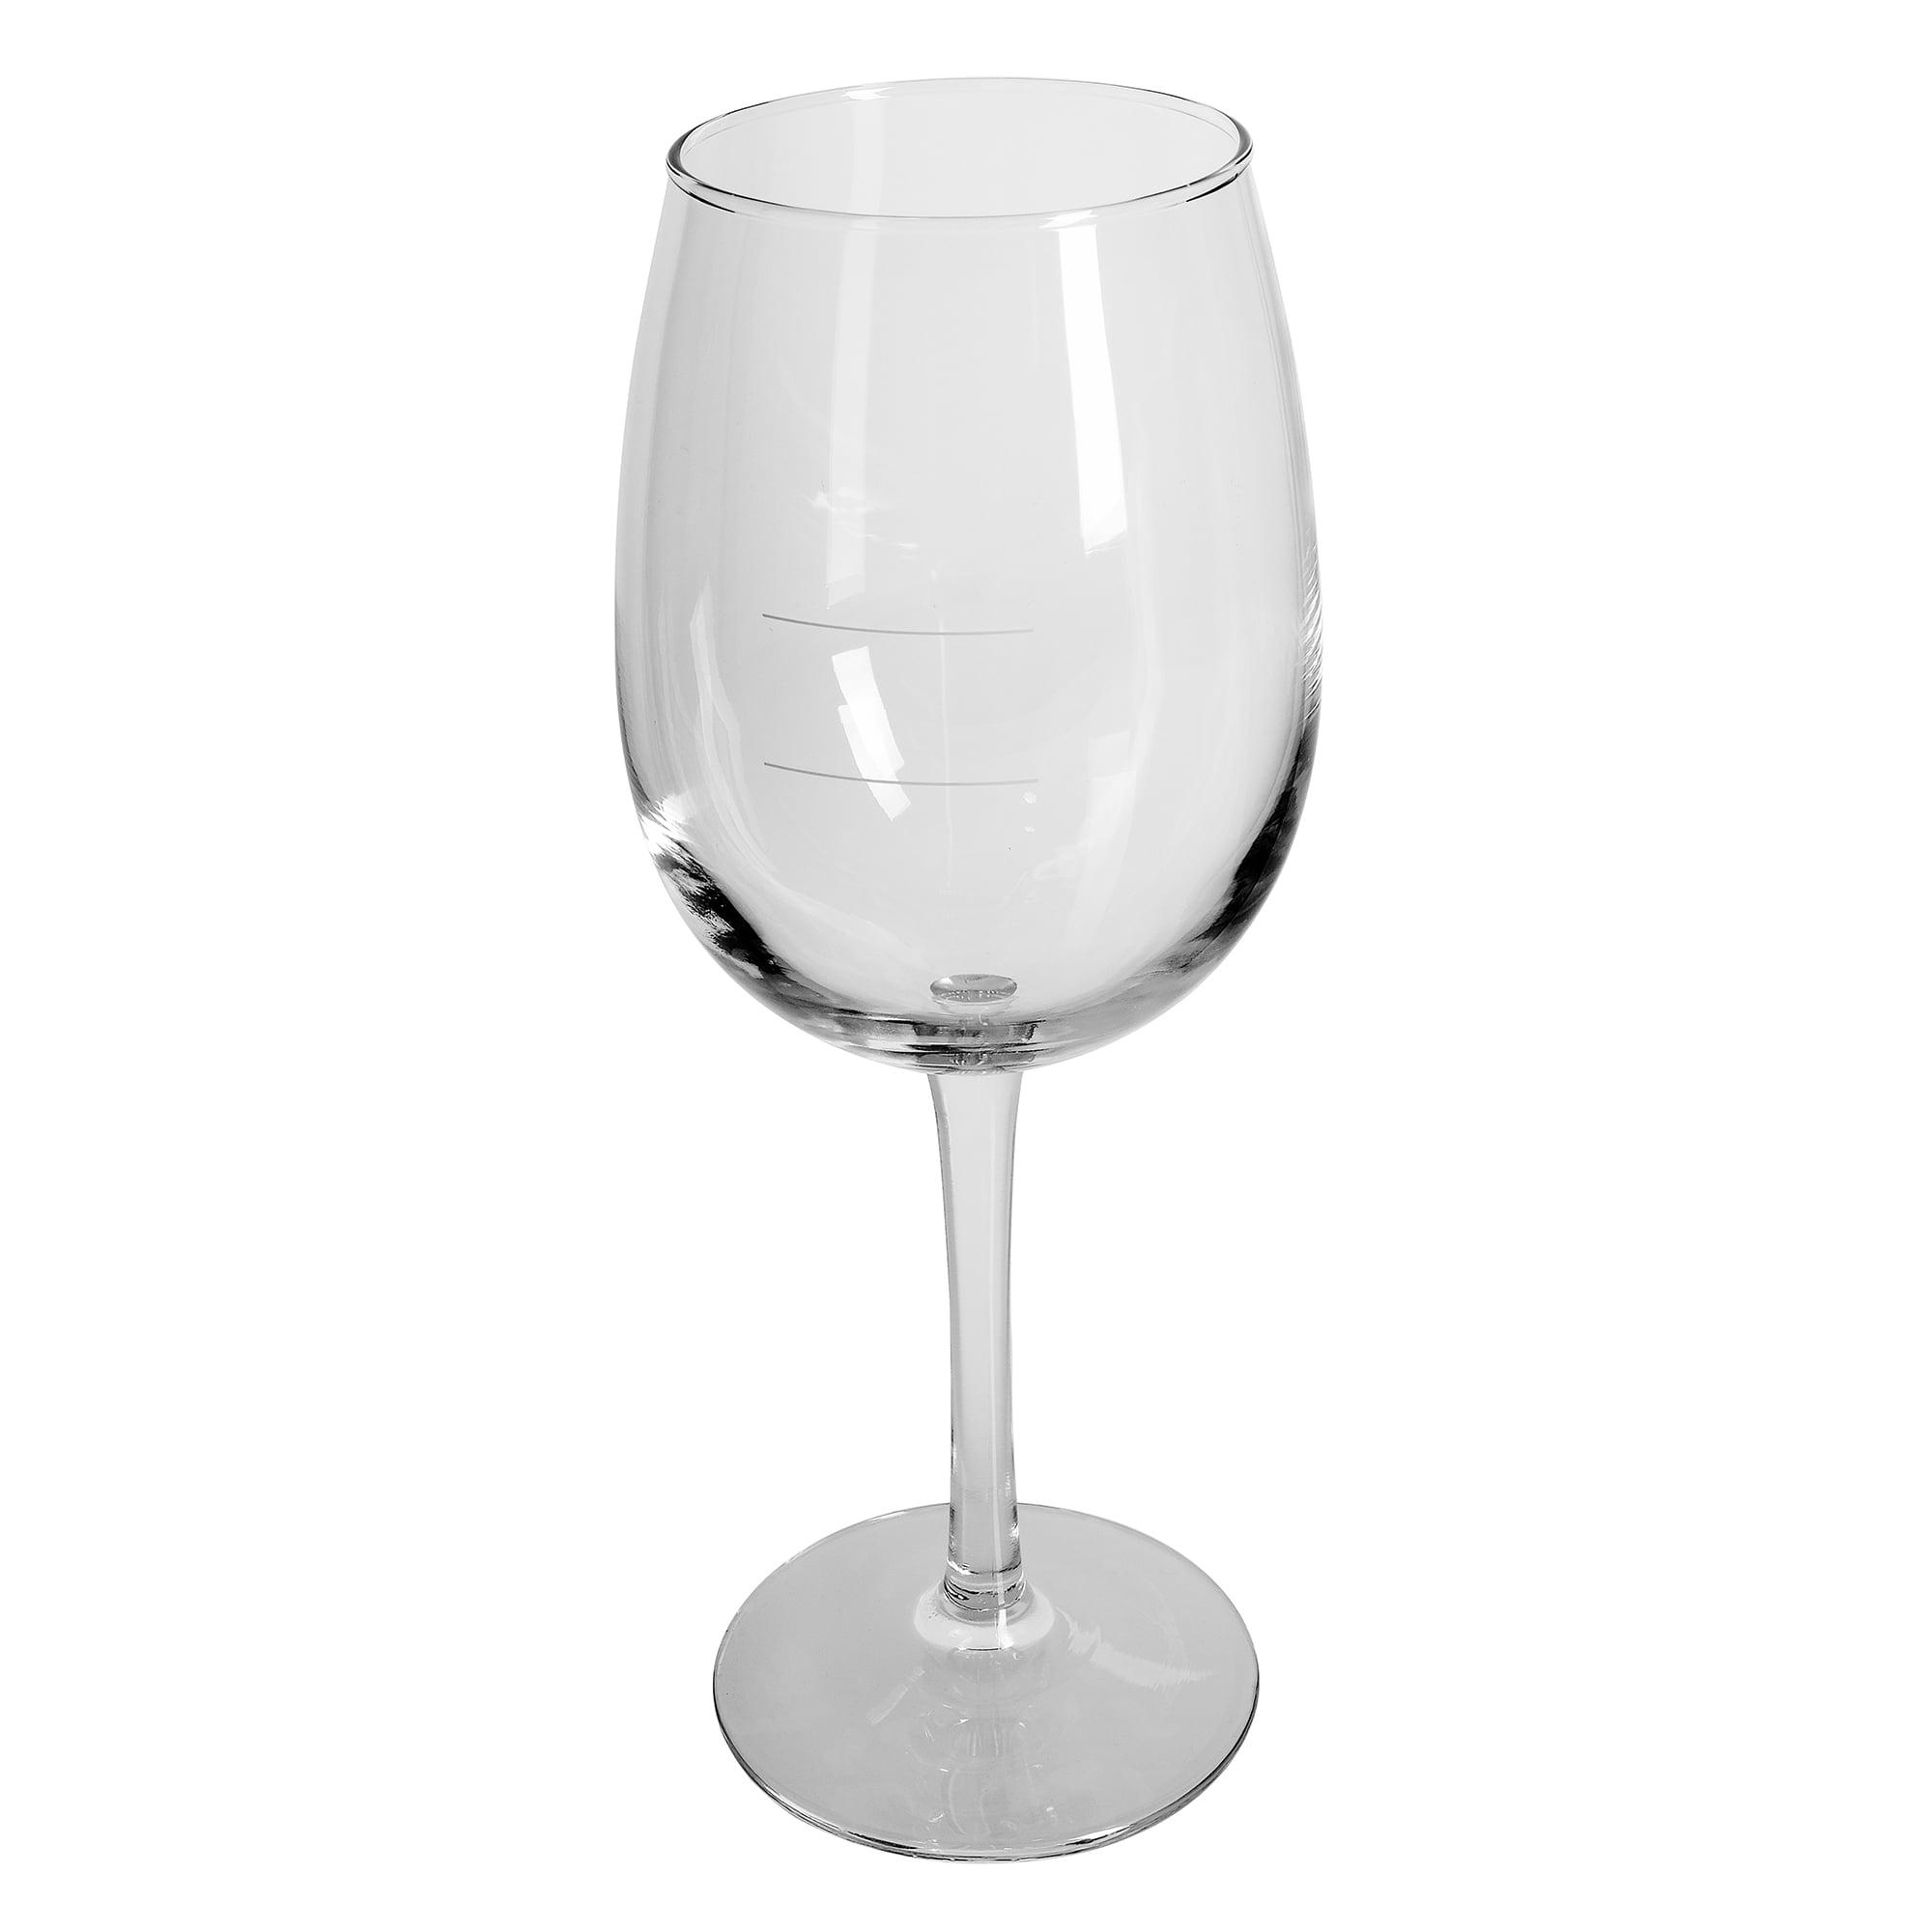 Libbey 7533/1178N 16-oz Safedge Wine Glass - Rim Guarantee, Clear